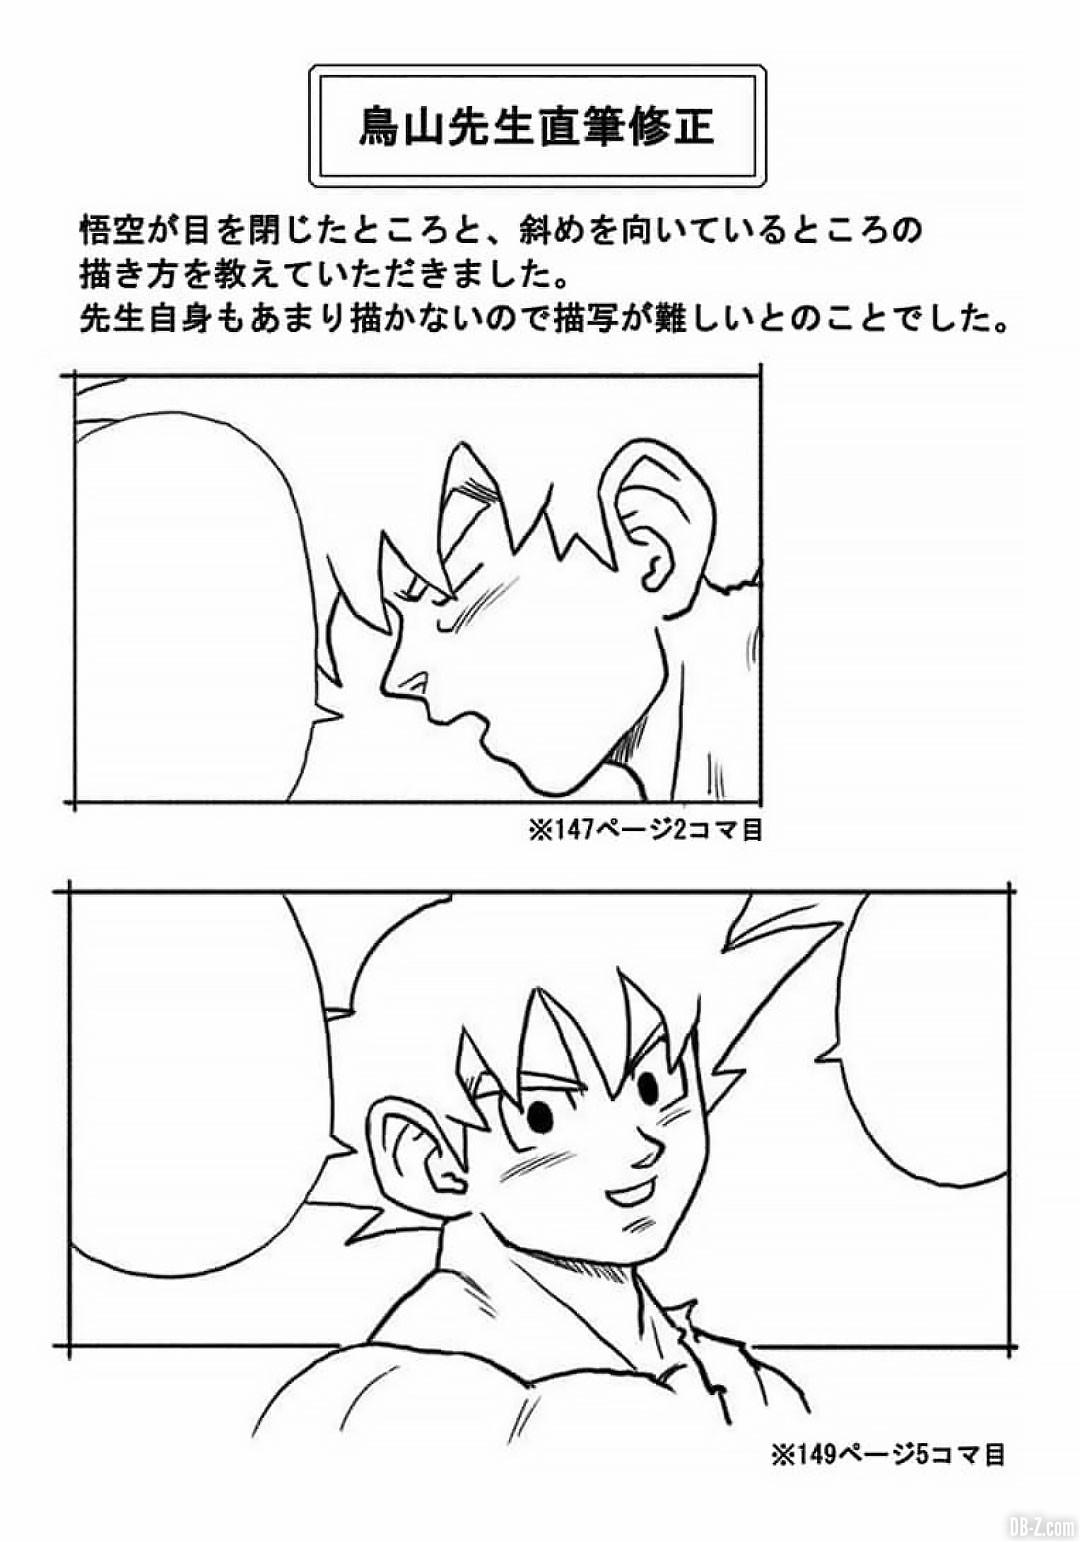 Akira Toriyama corrige Toyotaro Tome 14 de Dragon Ball Super